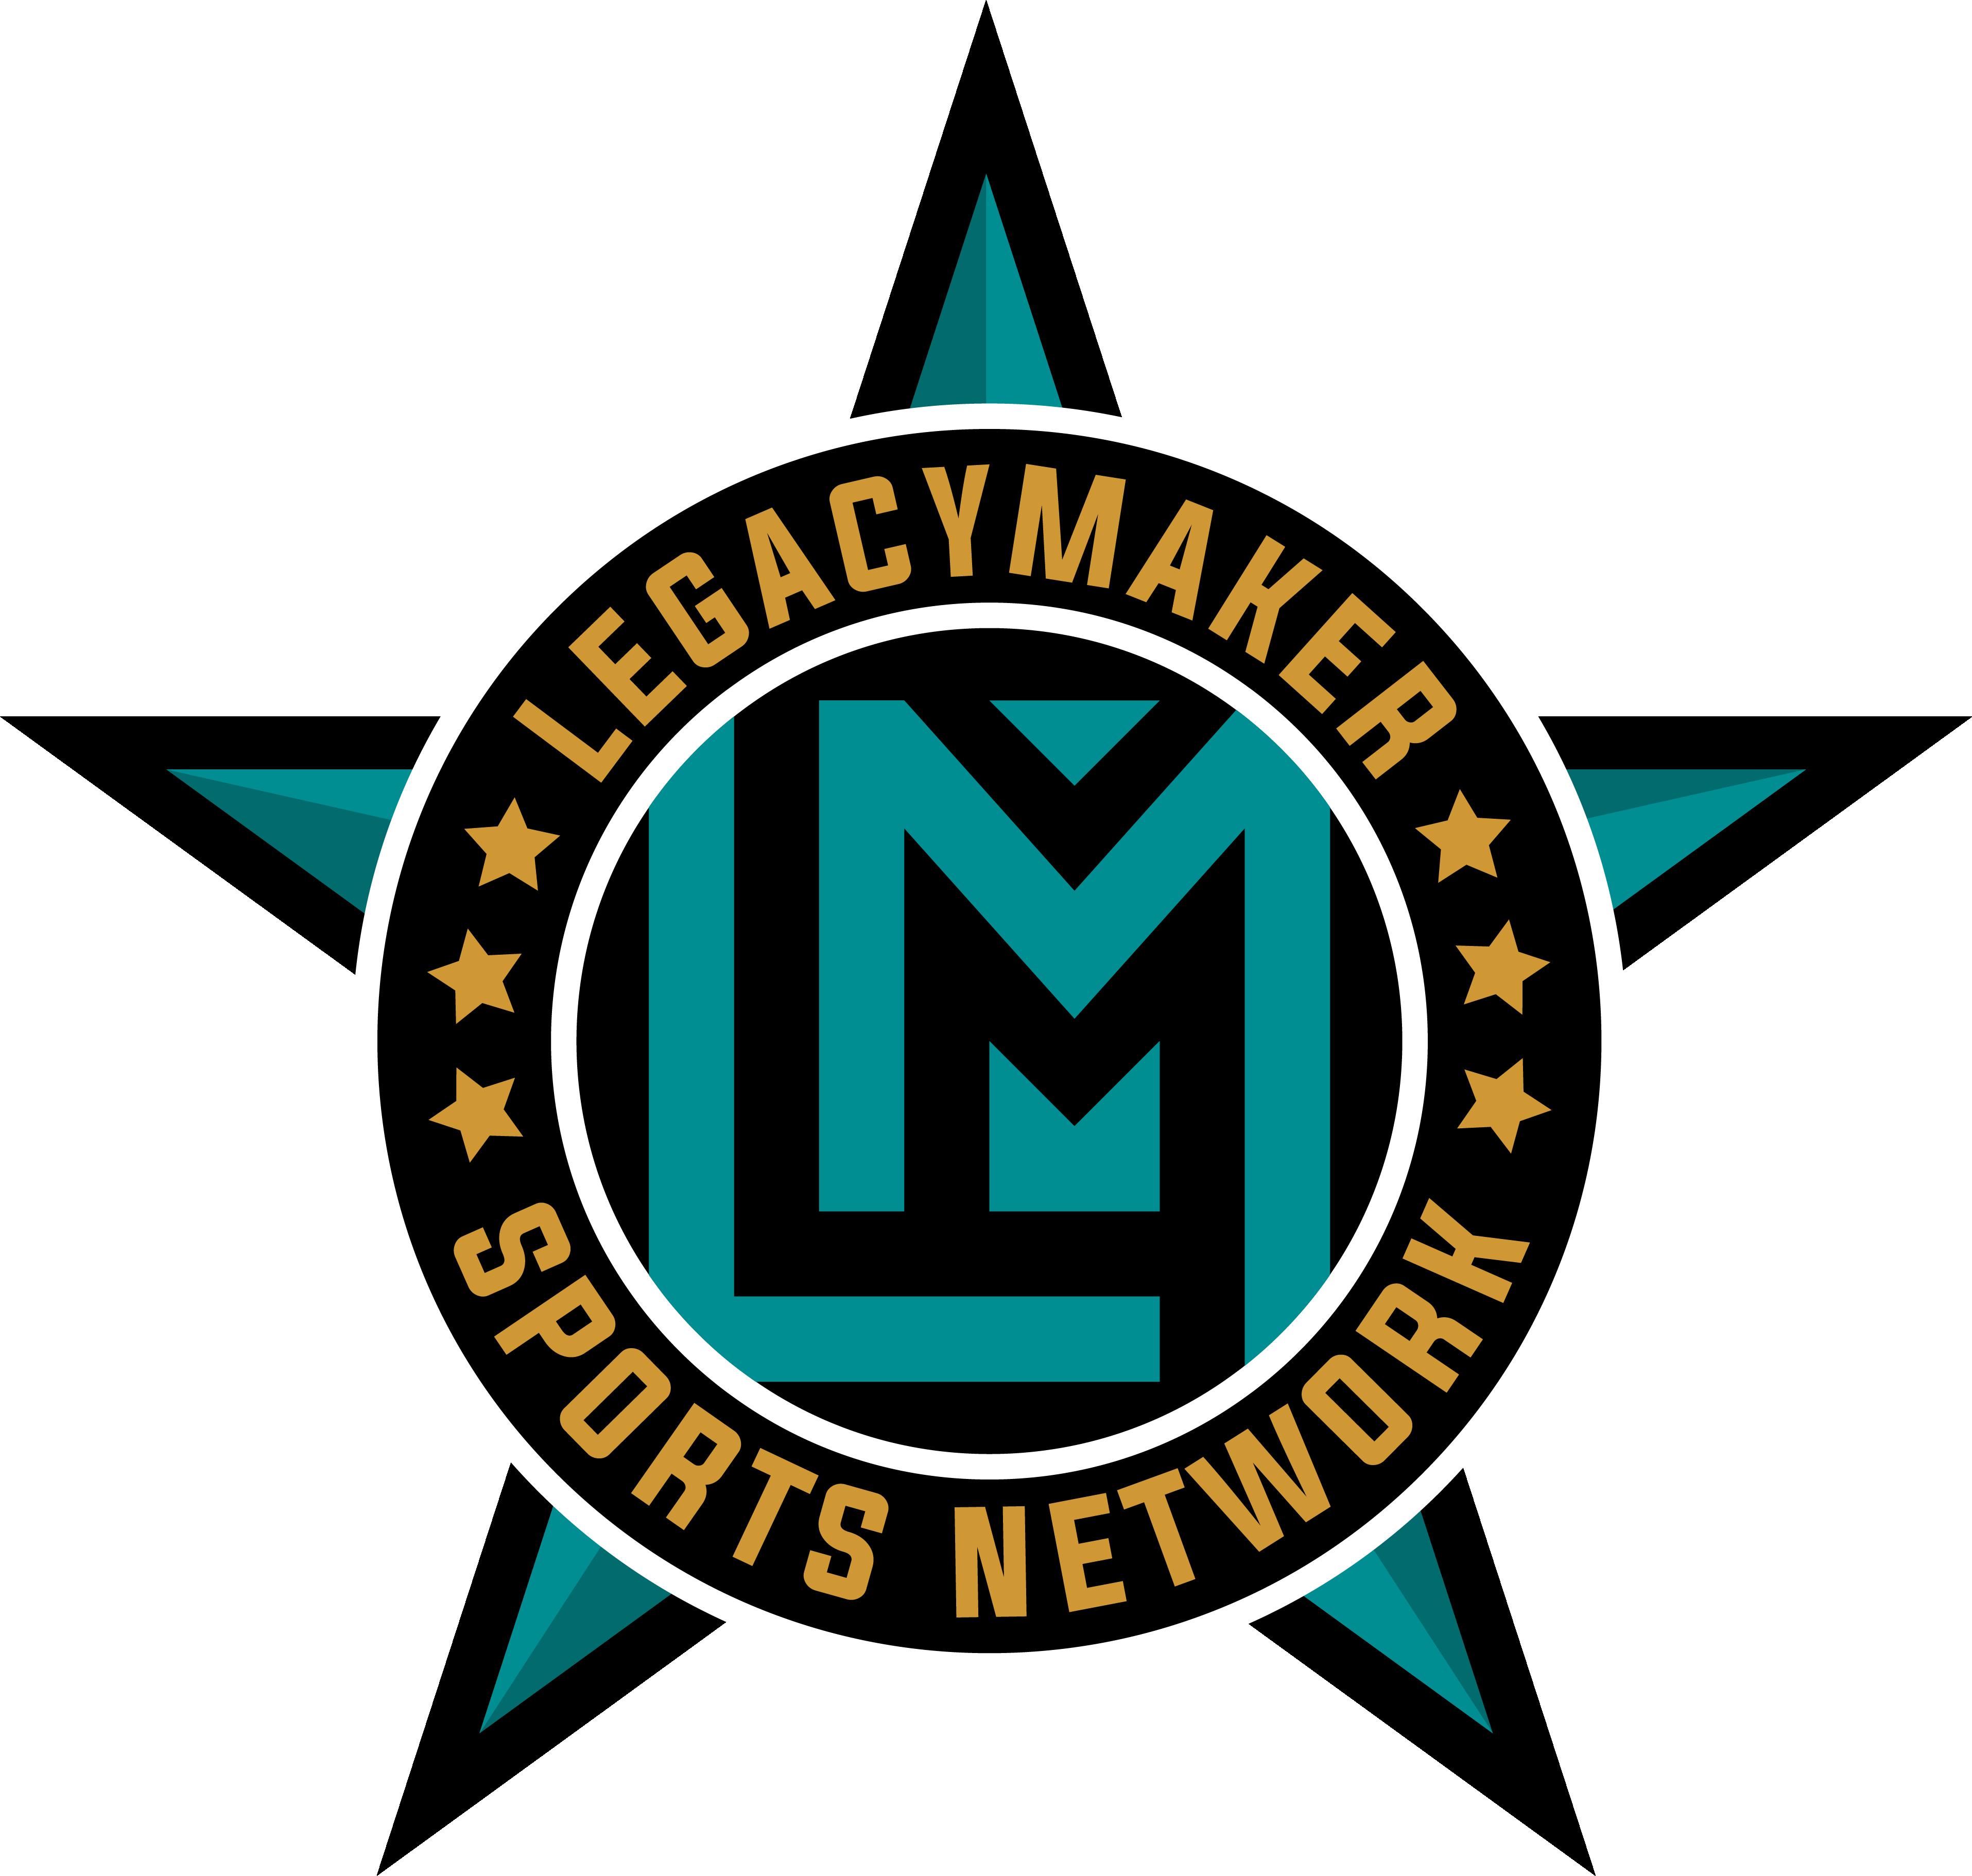 LegacyMaker Sports Network